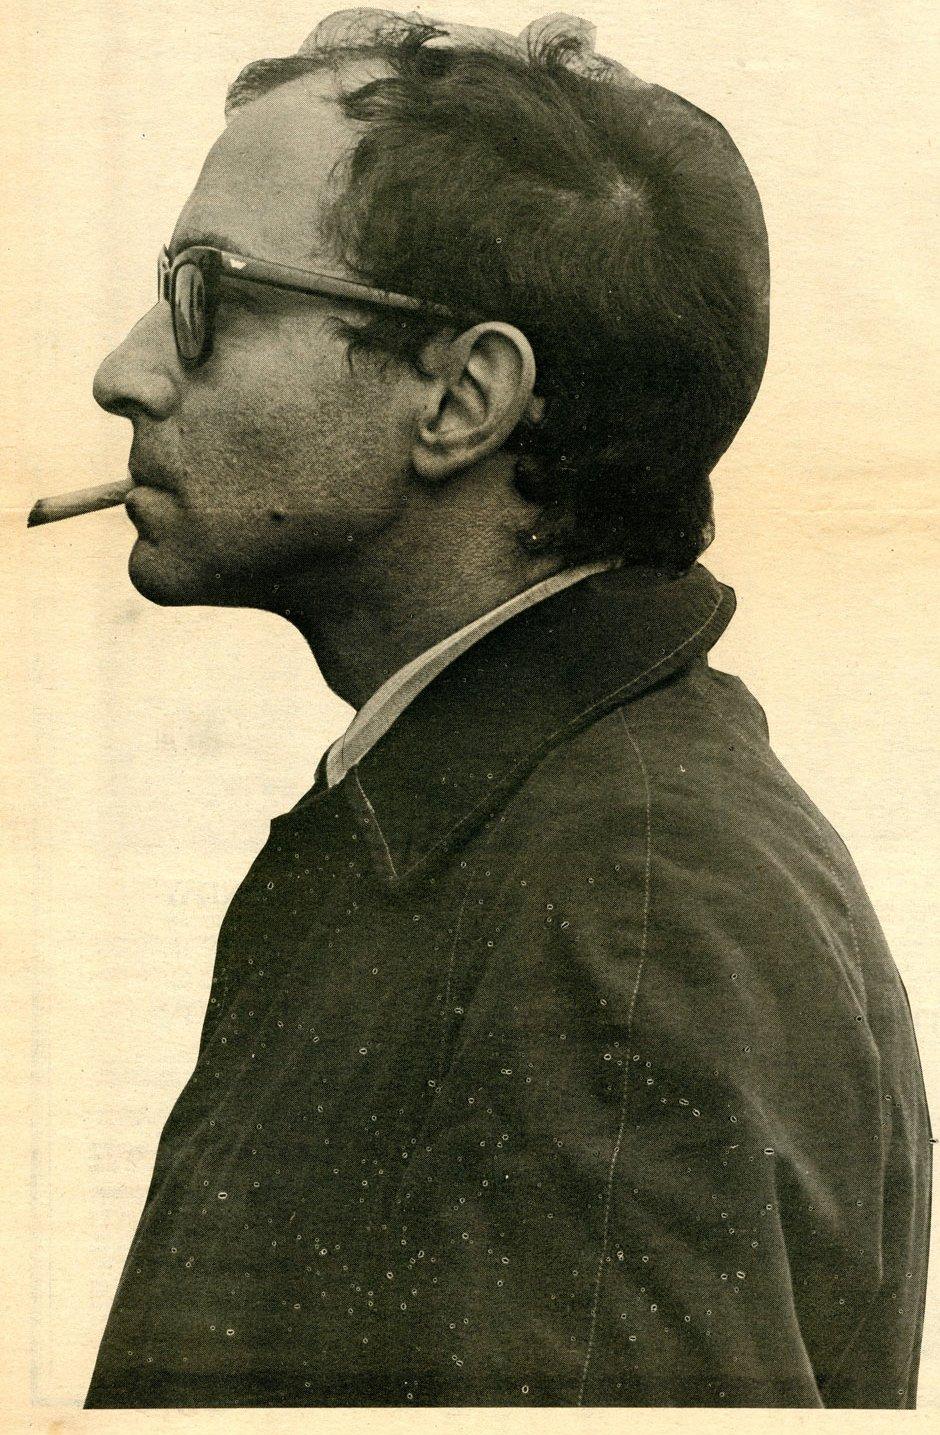 [Jean-Luc Godard] 1